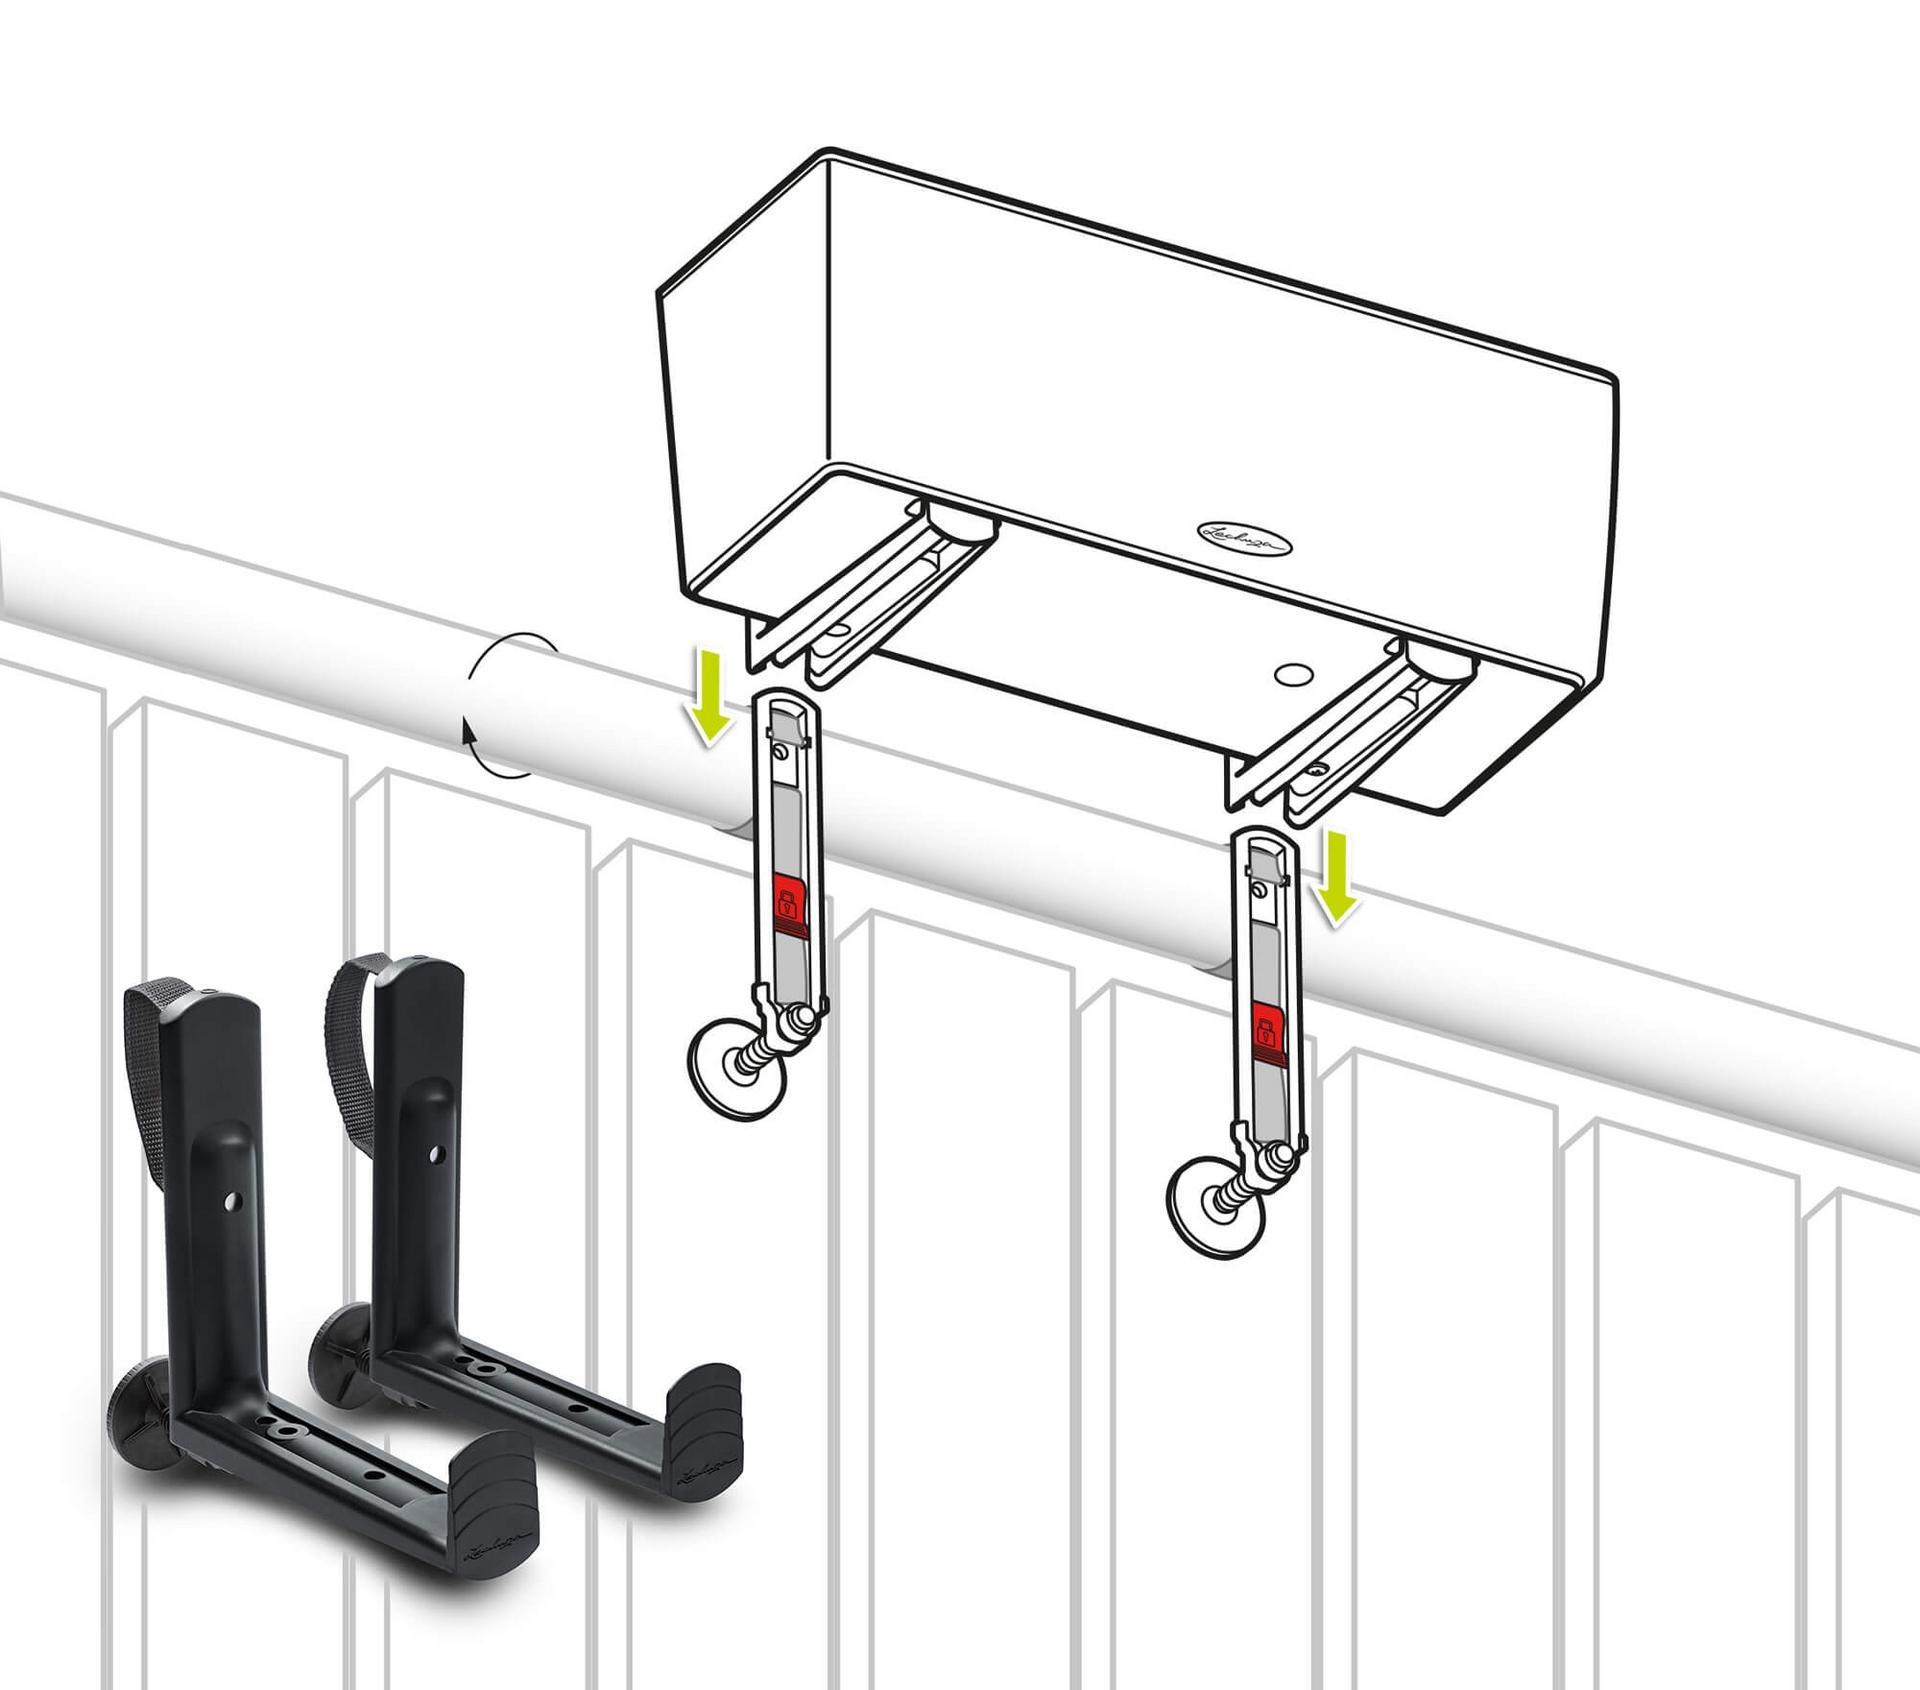 Balconera držáky na zábradlí